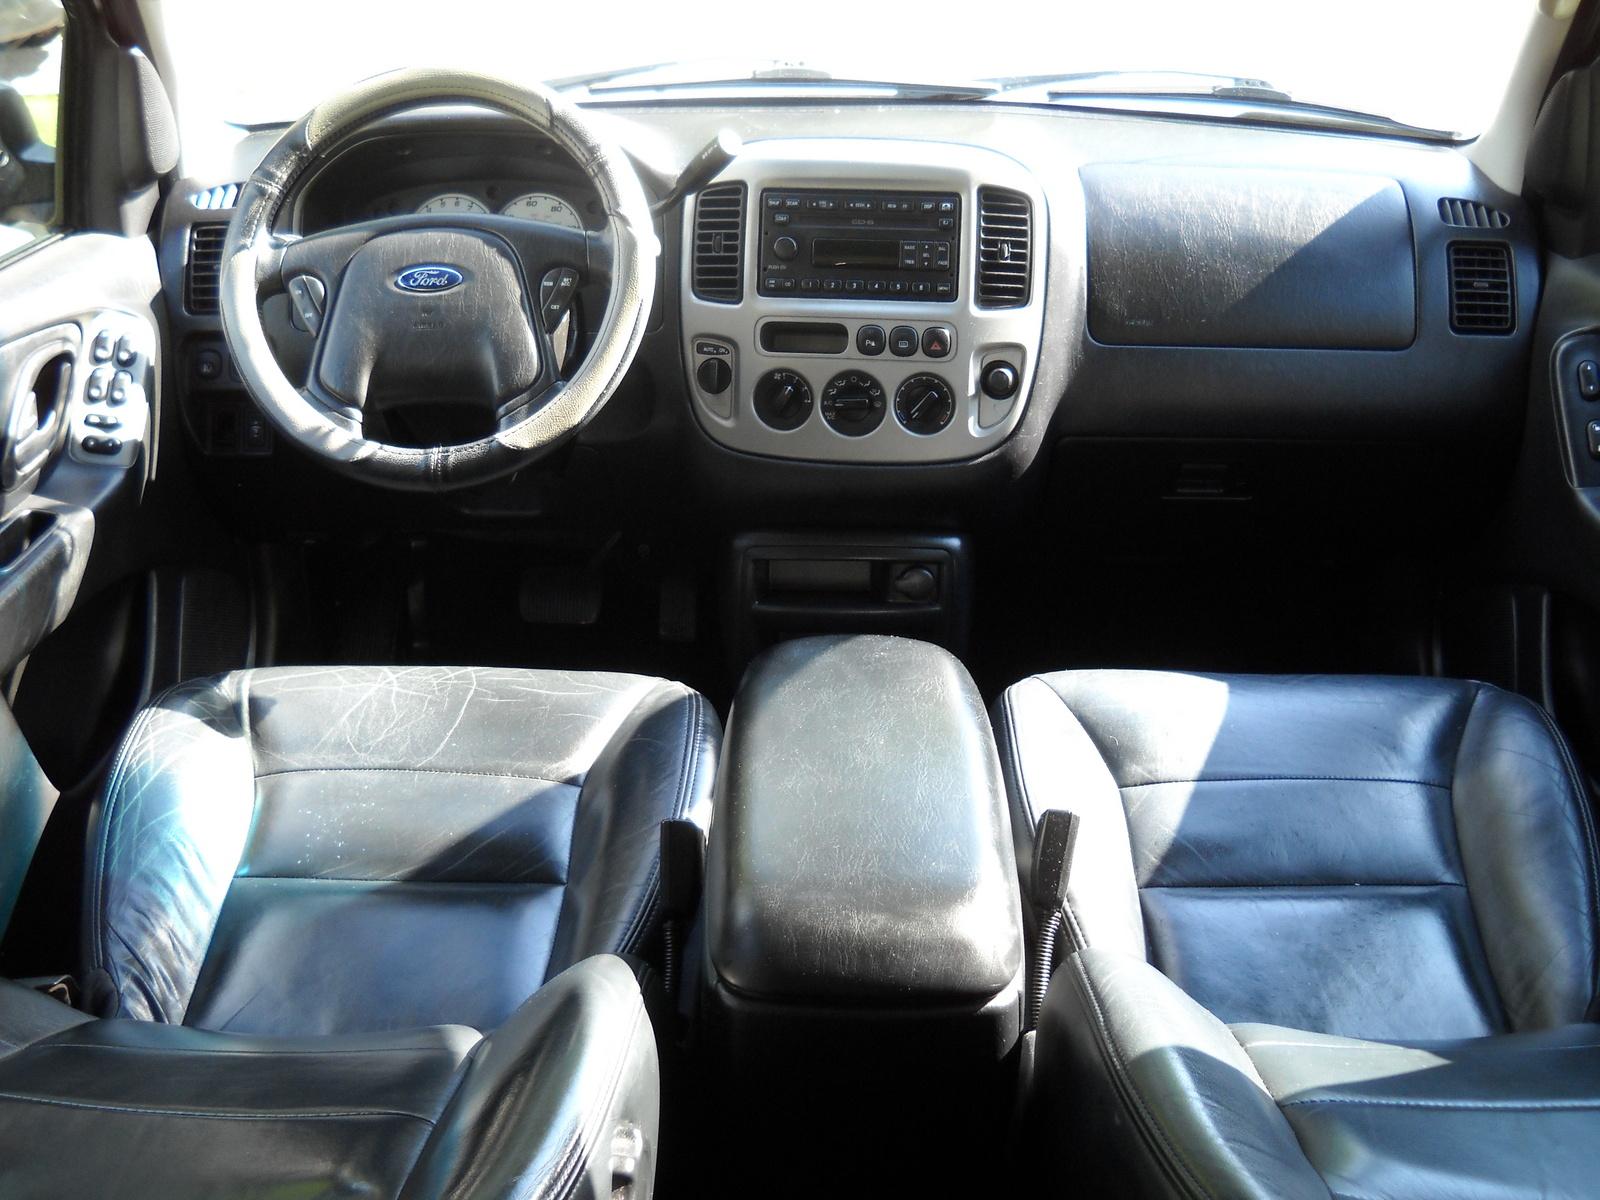 2002 Ford Explorer Xls >> 2003 Ford Escape - Interior Pictures - CarGurus